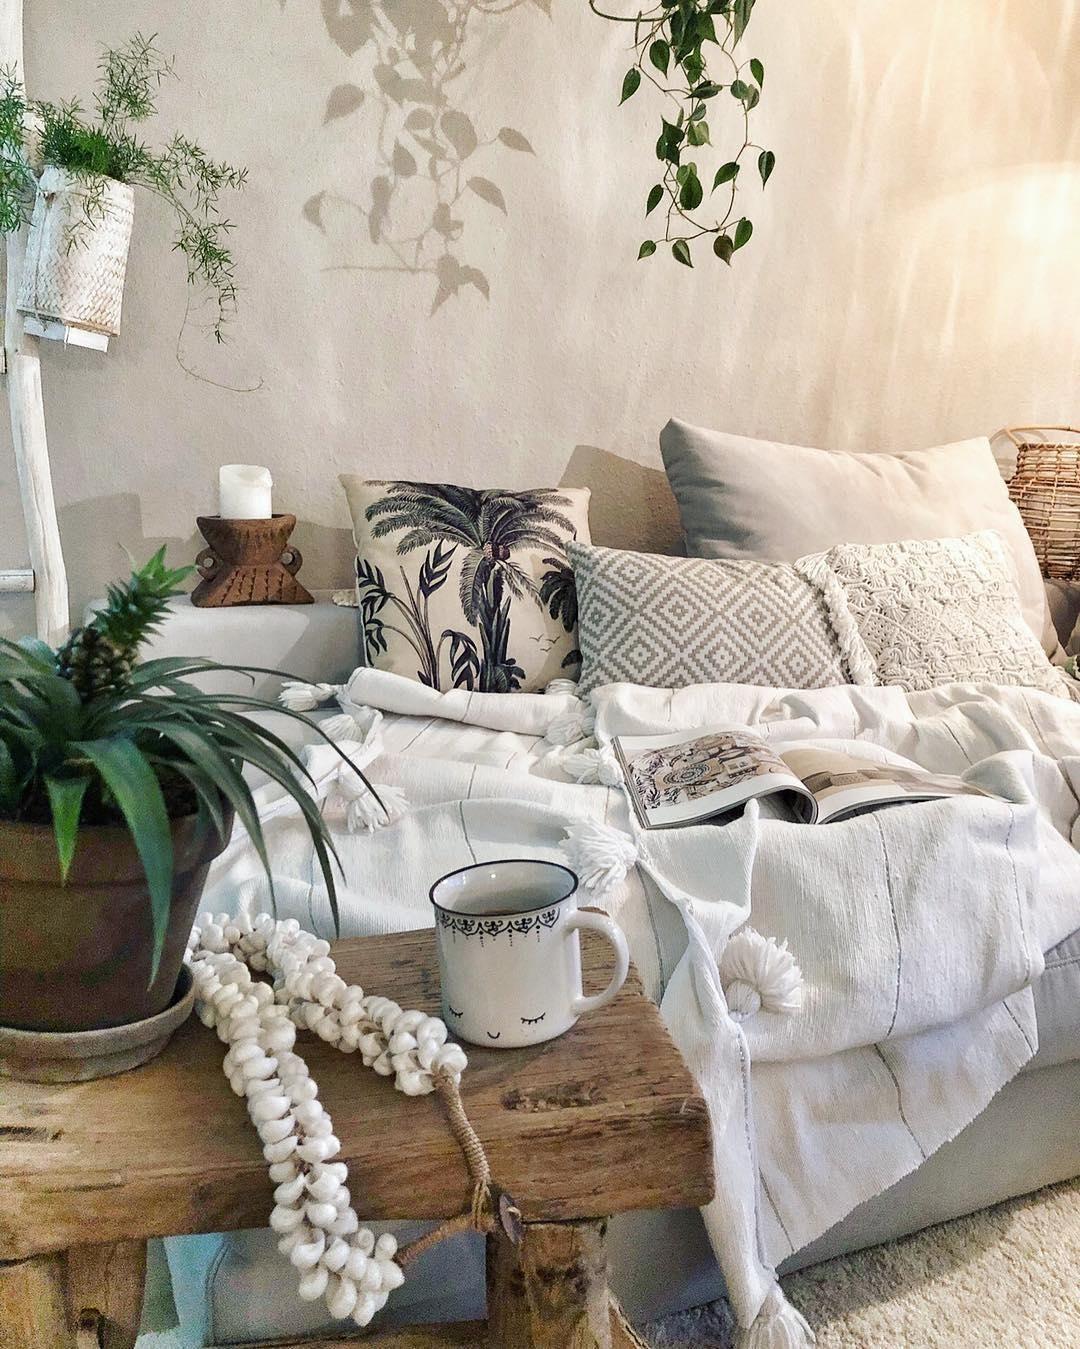 hocker lawas 39 boho interior 39 bohemian living wohnung. Black Bedroom Furniture Sets. Home Design Ideas